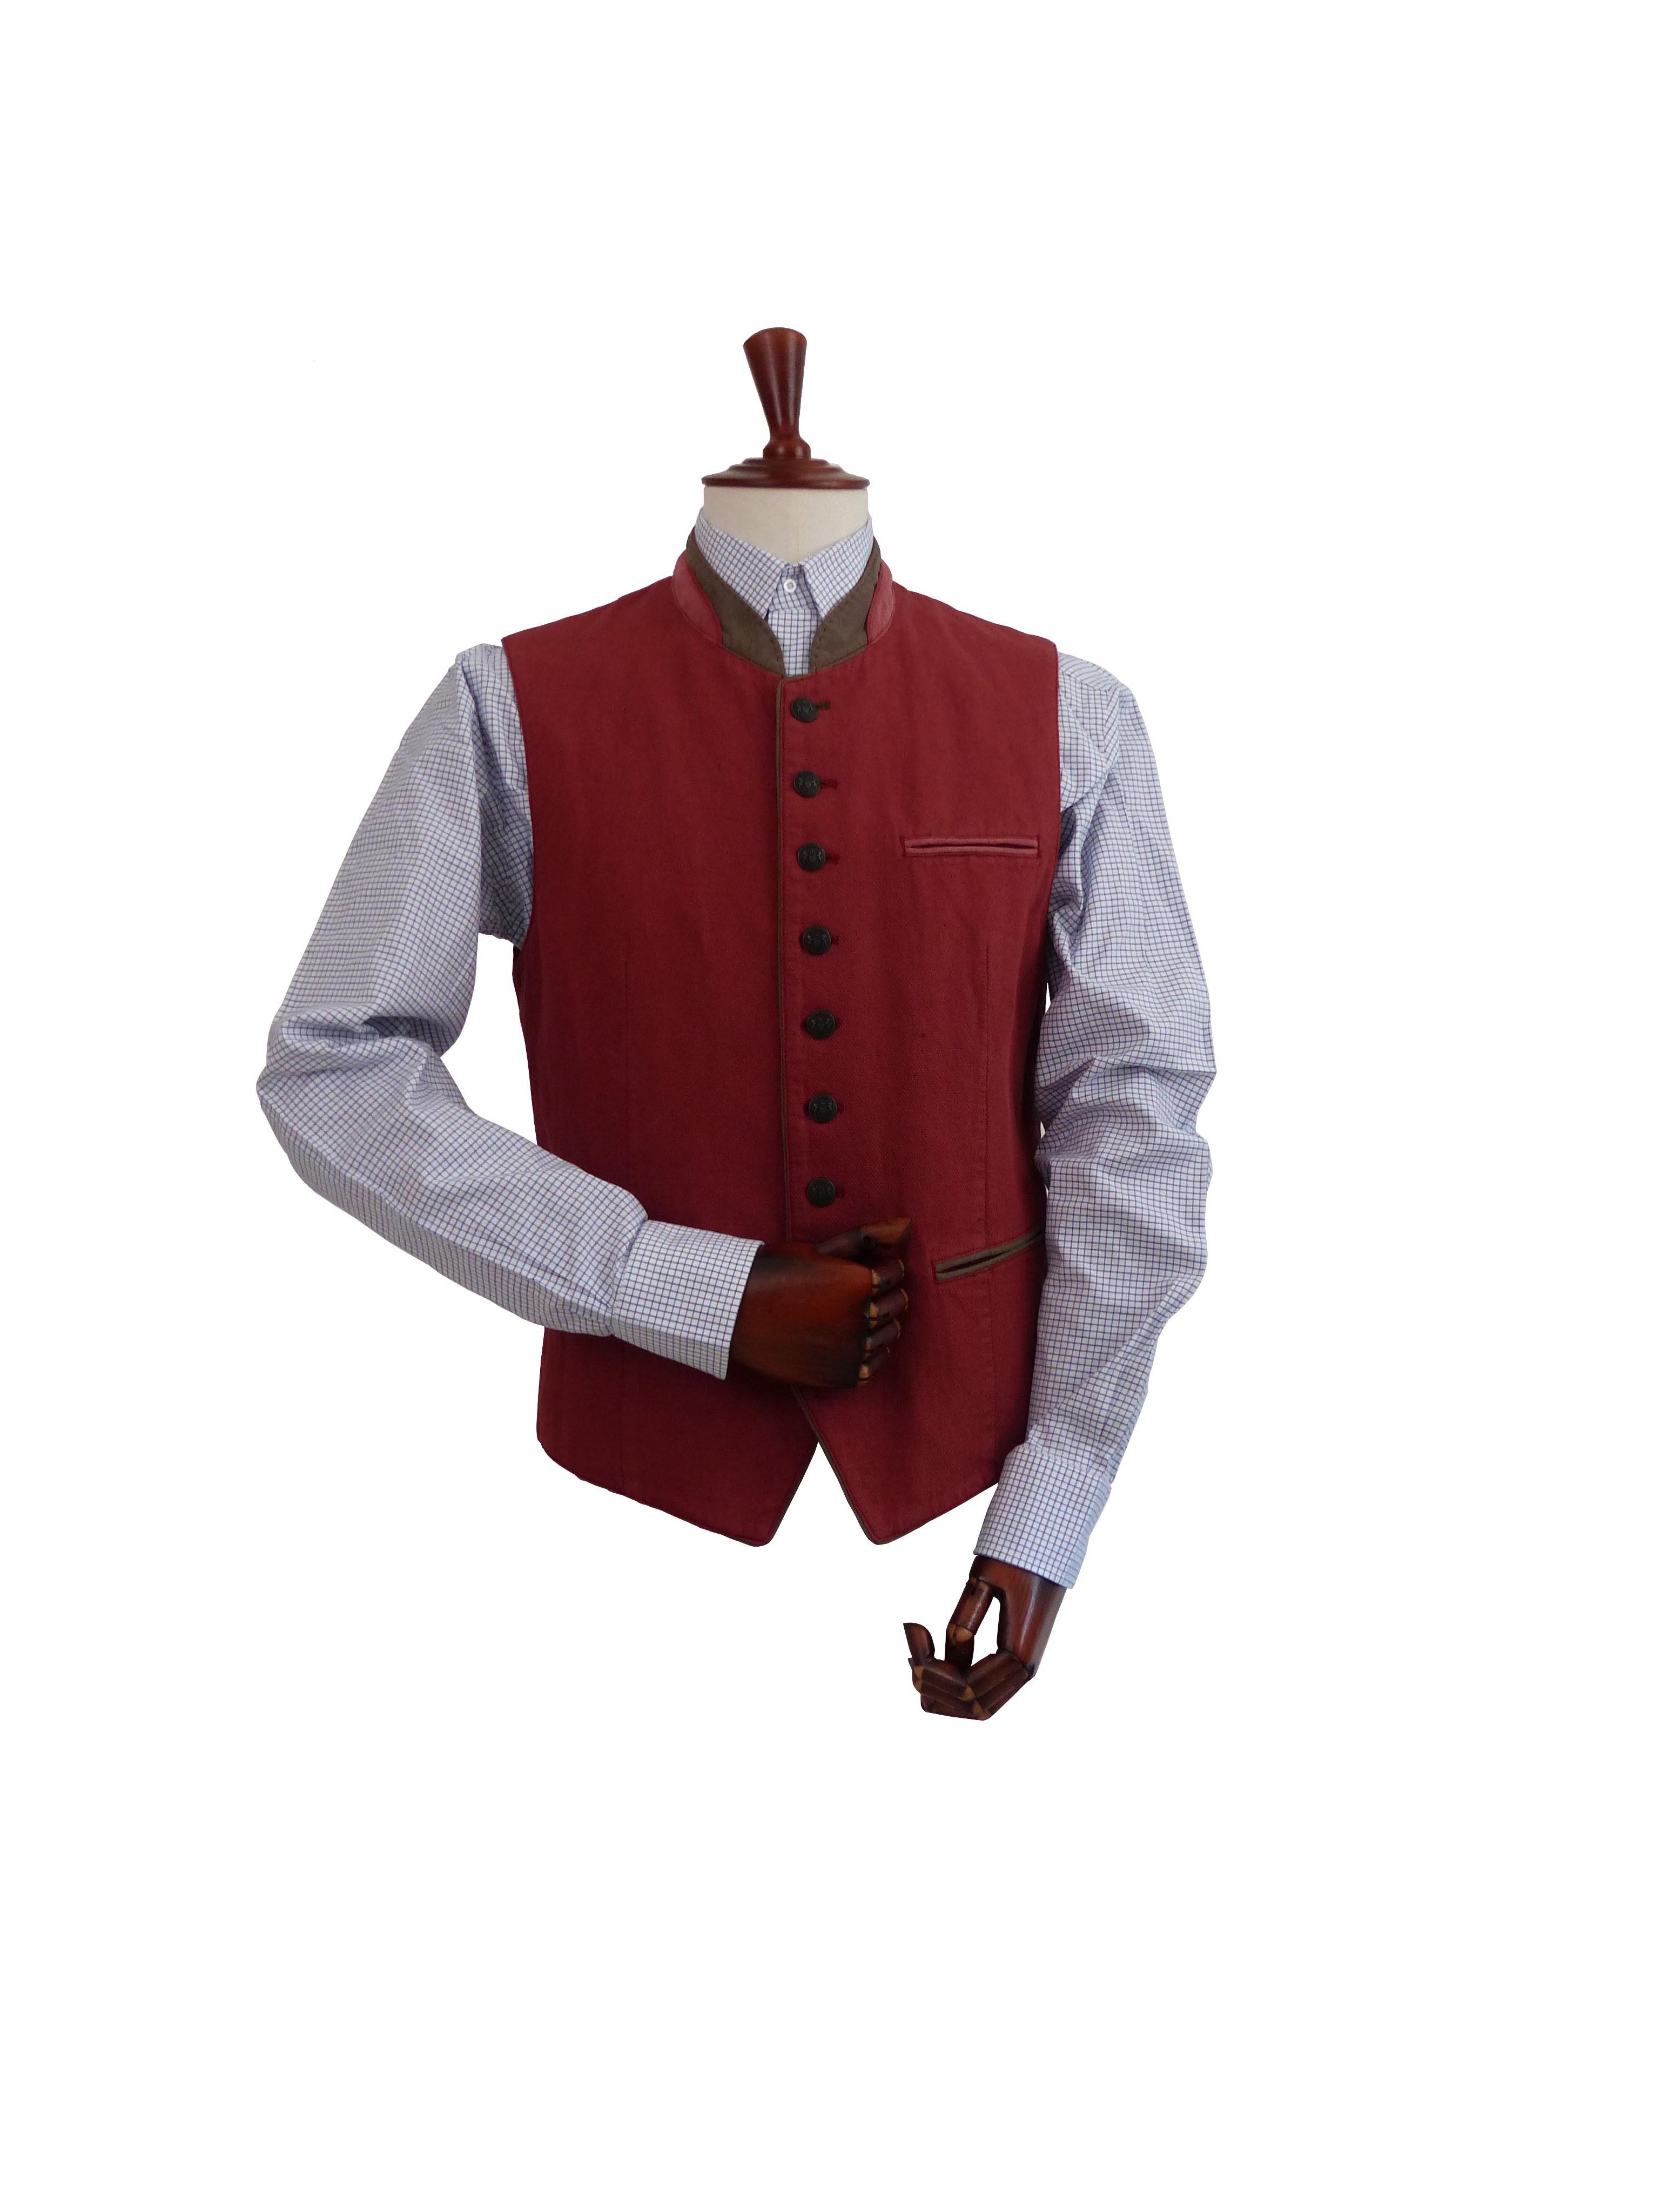 Gilet Iber Garment Dyed Terracota Schneiders